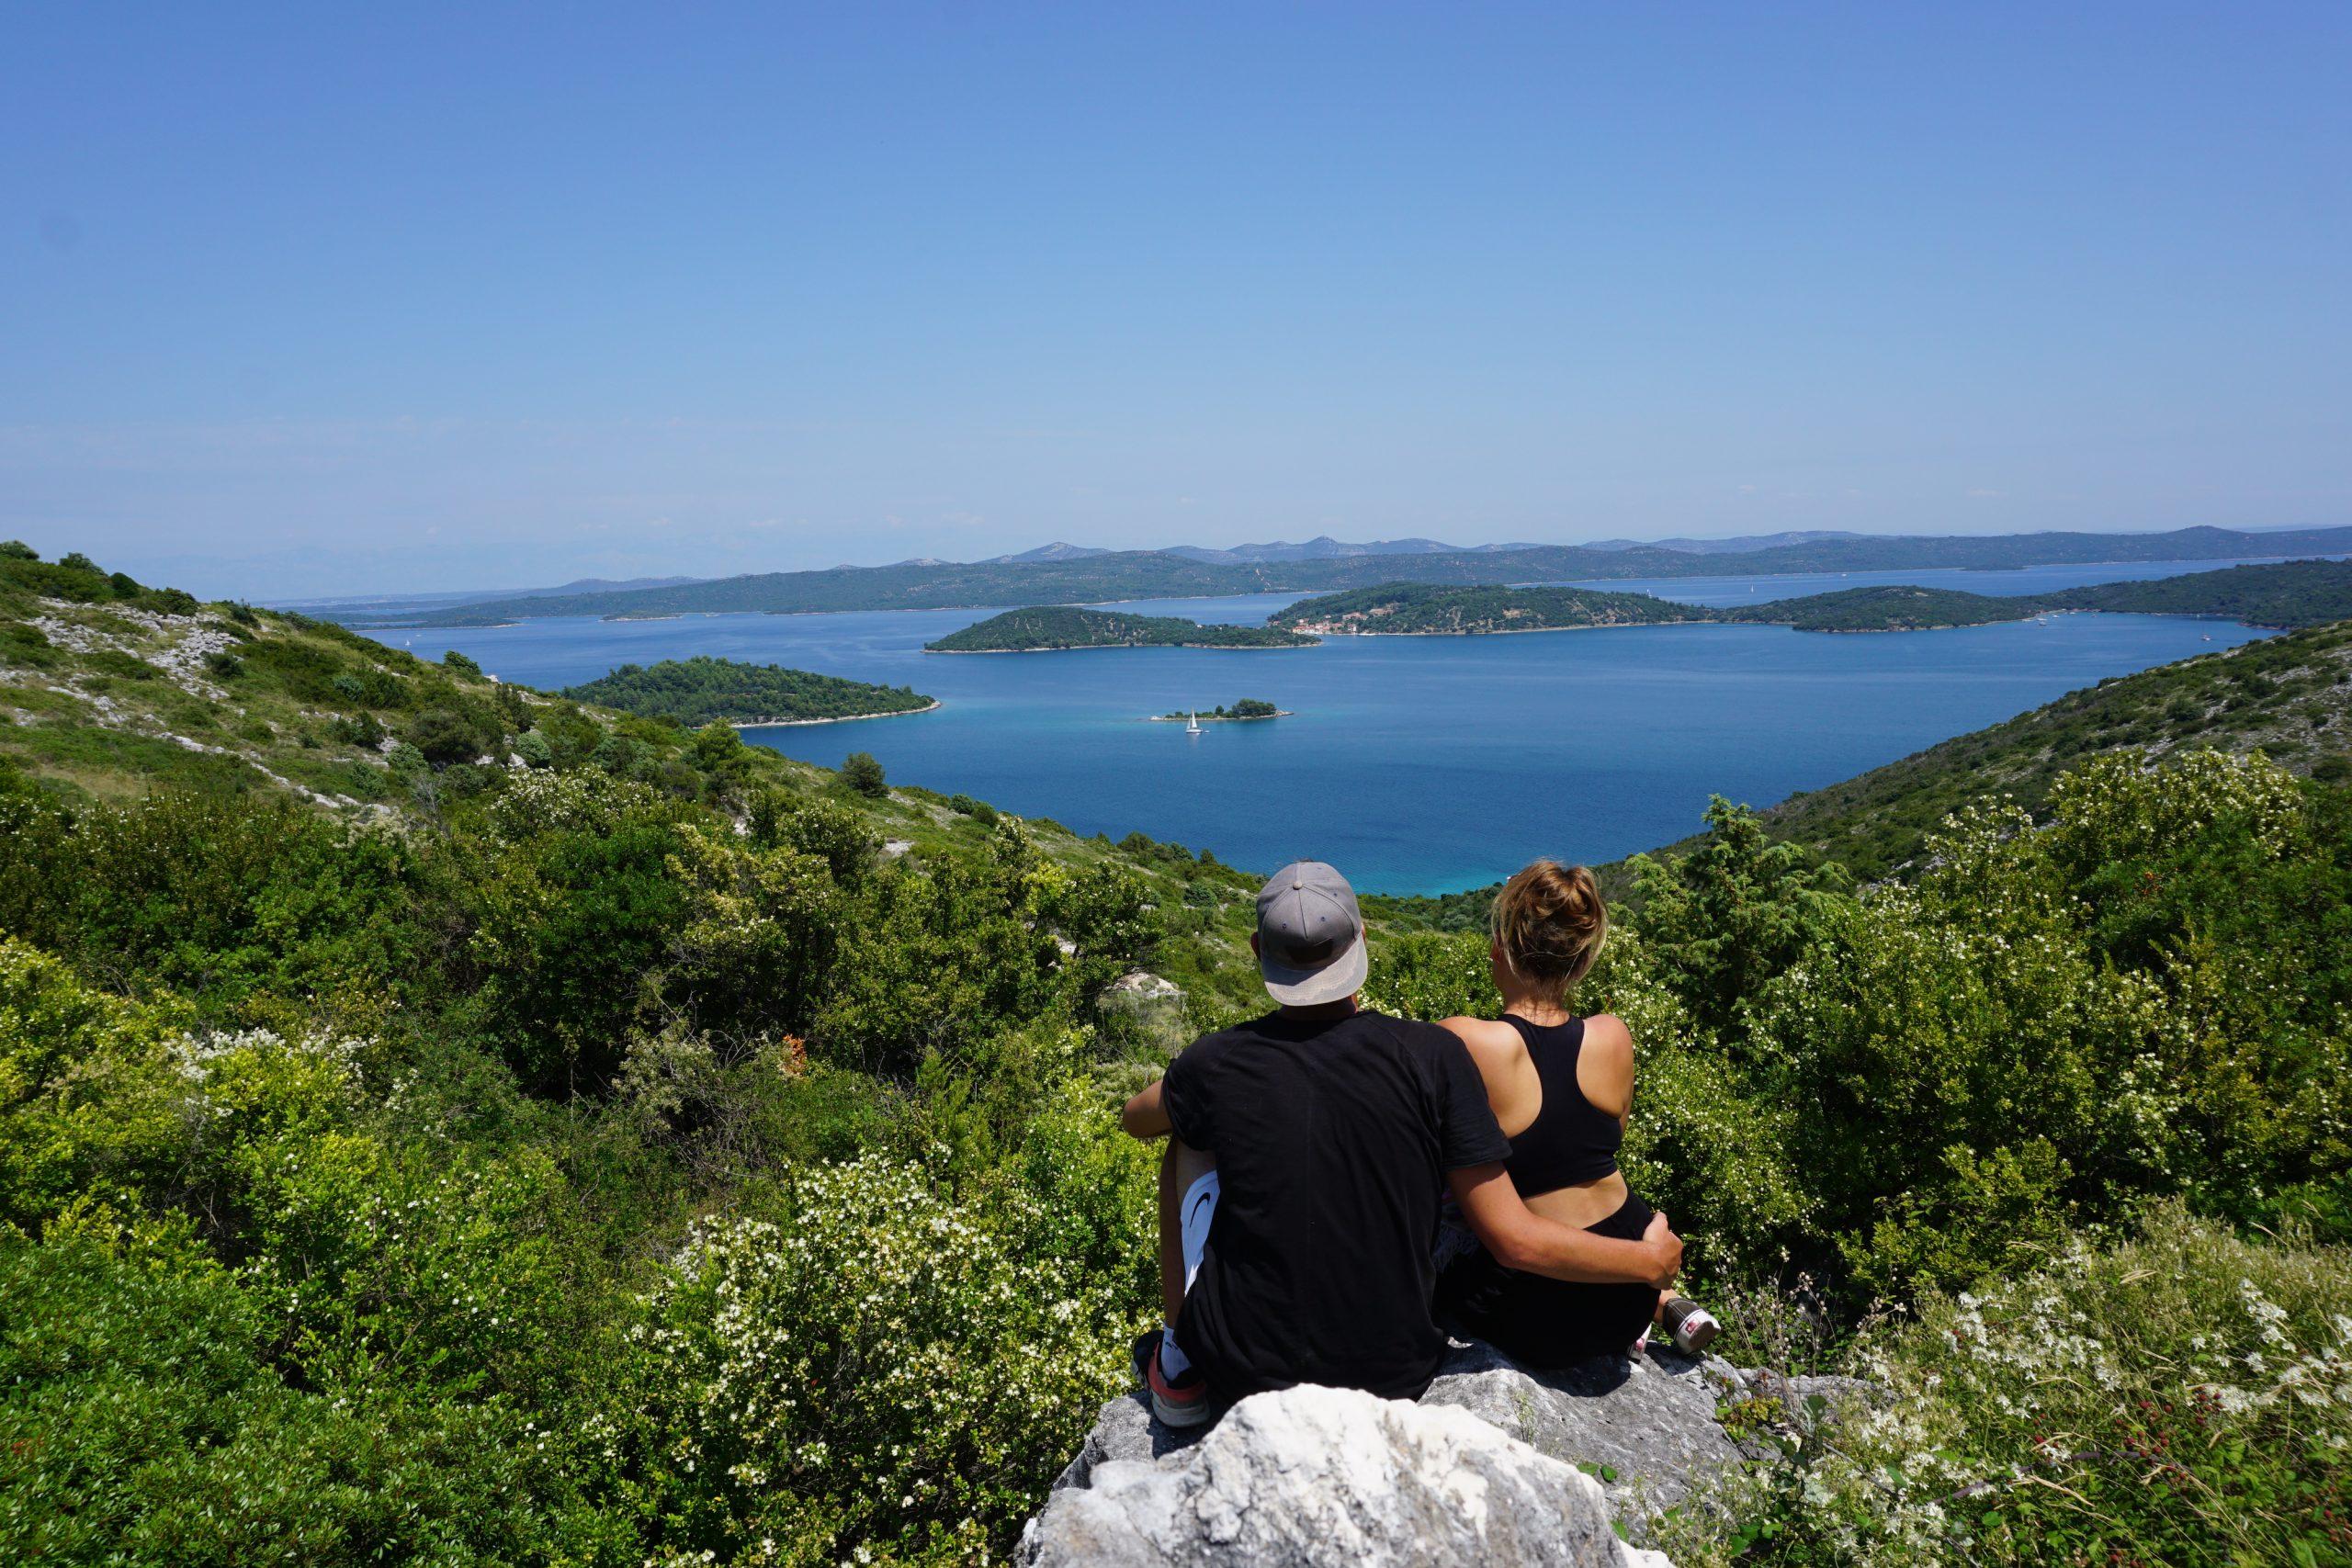 dugi otok island